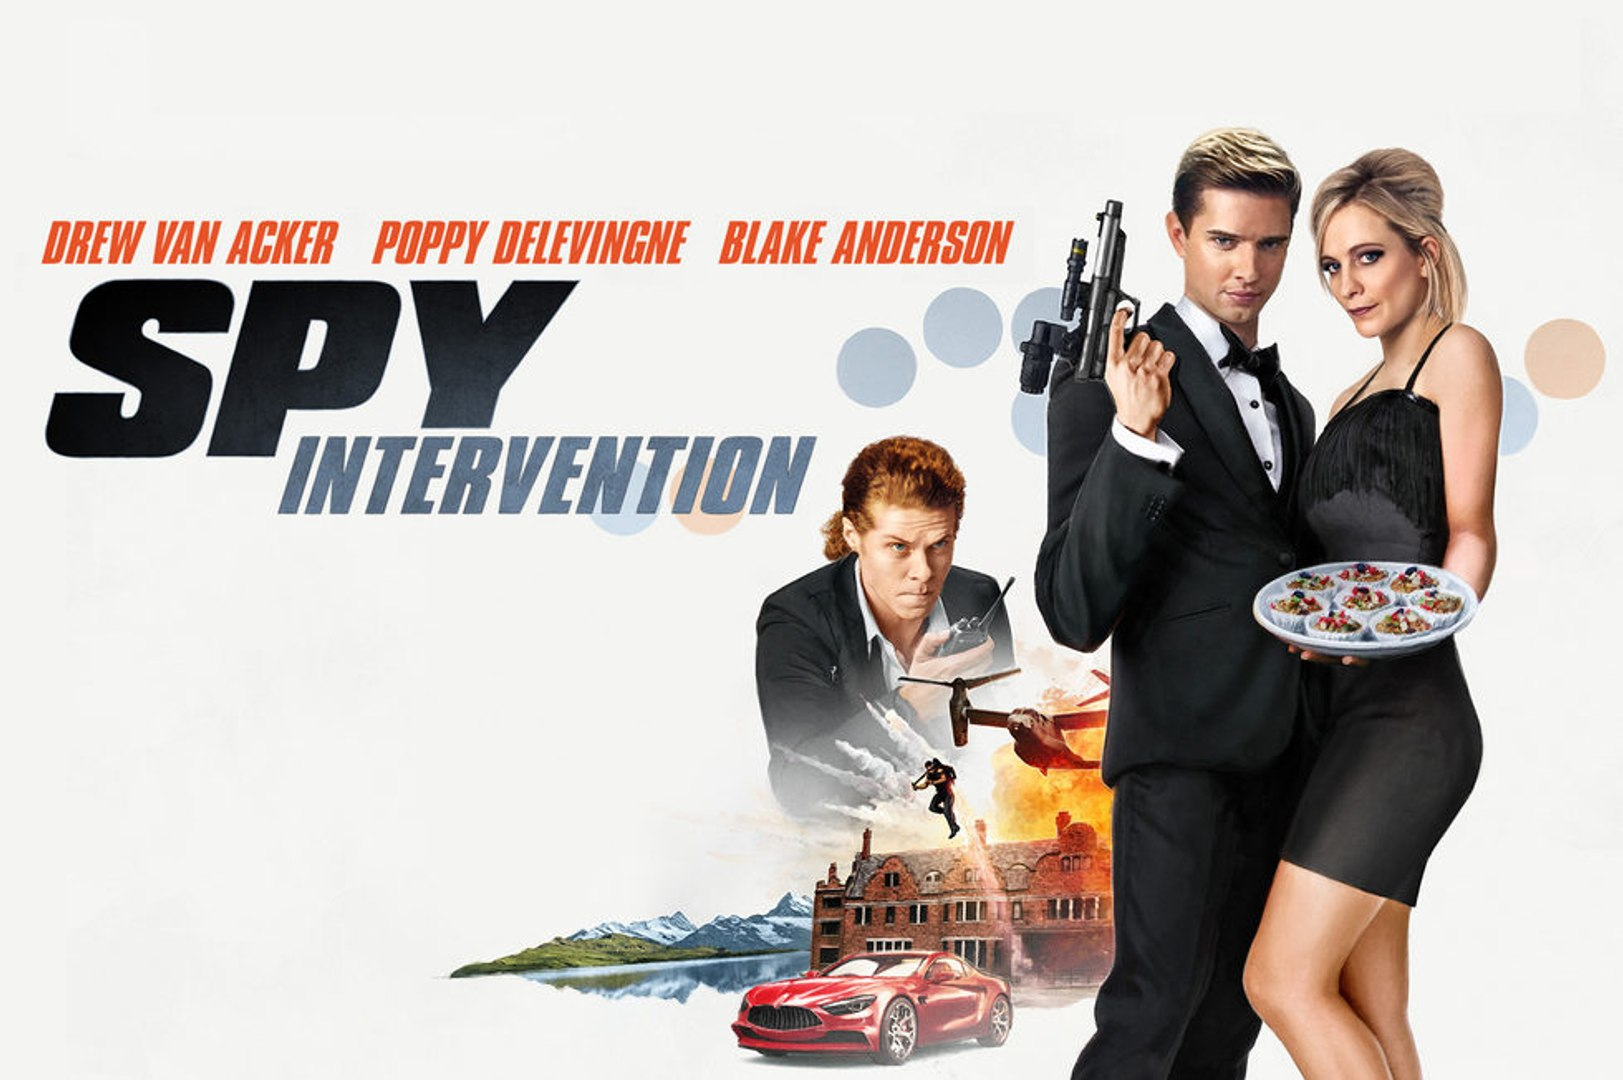 فيلم Spy Intervention 2020 مترجم